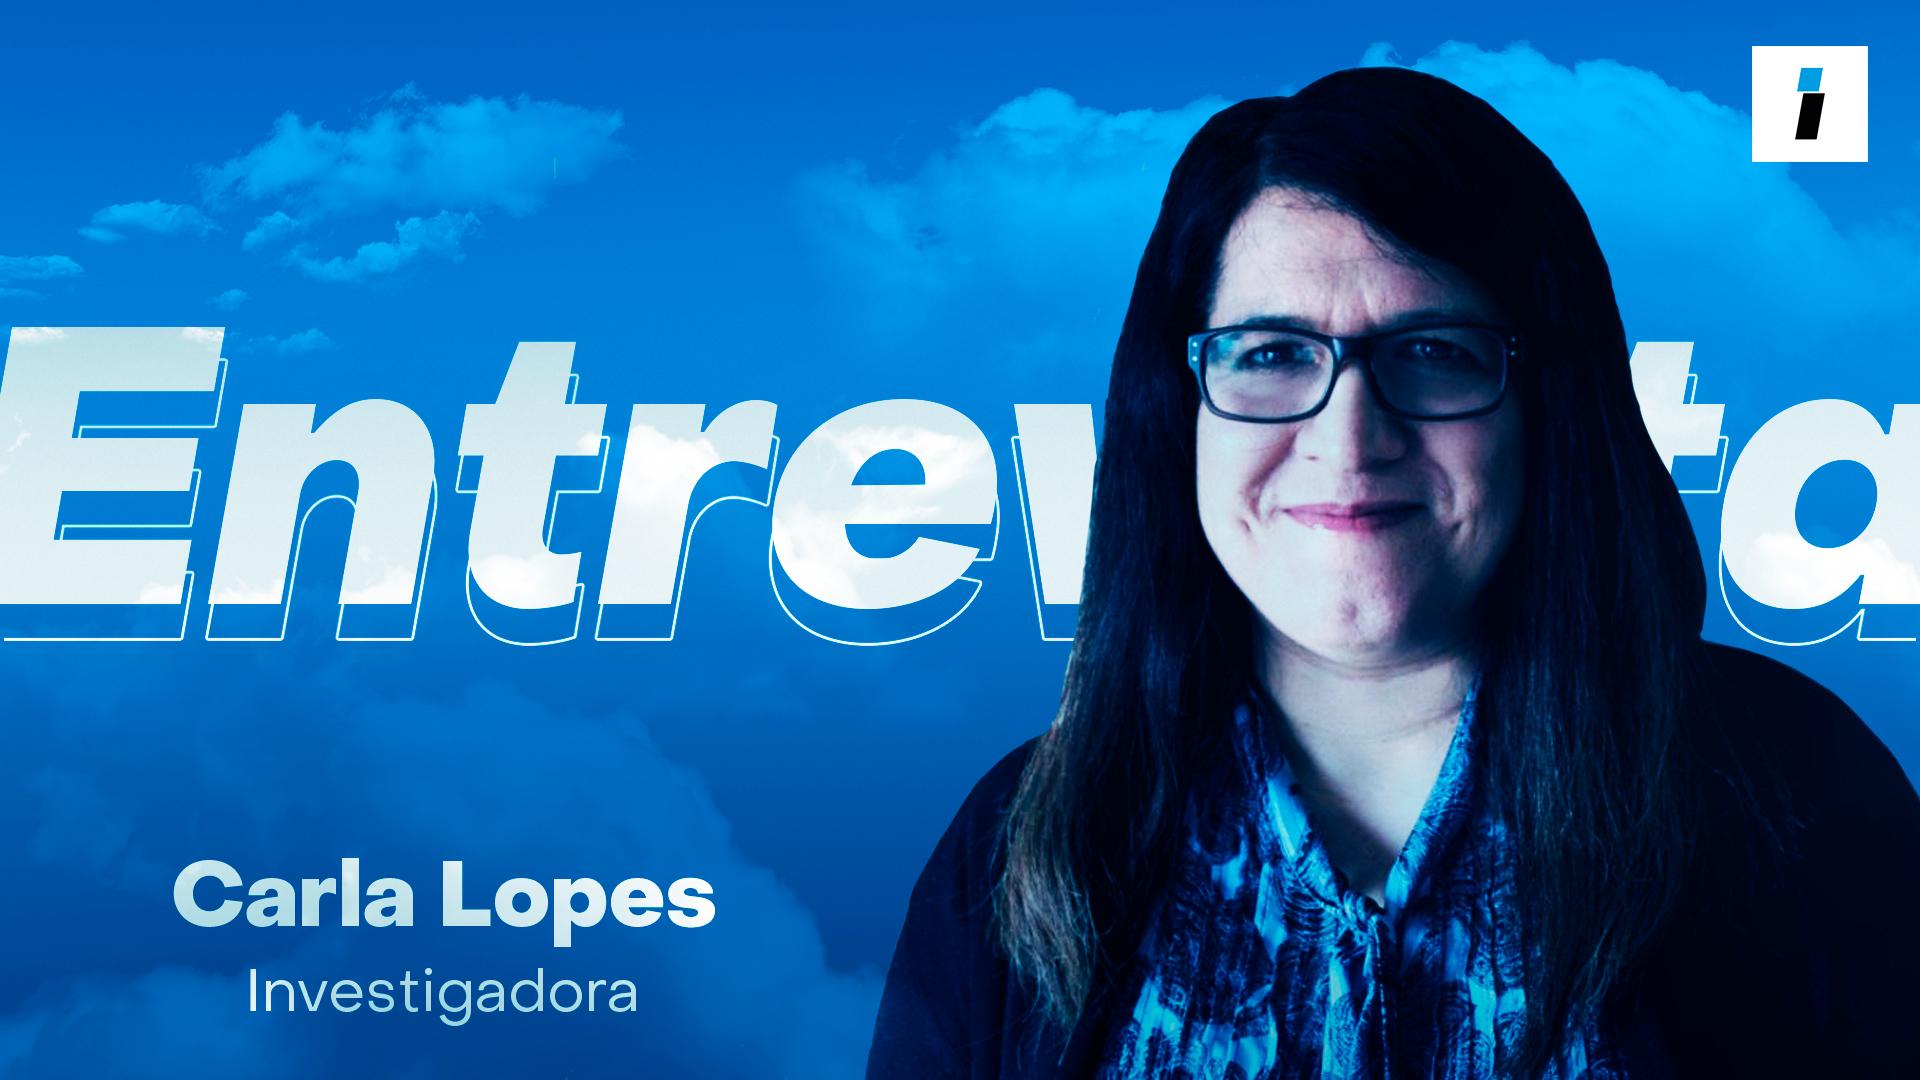 Carla Lopes, investigadora